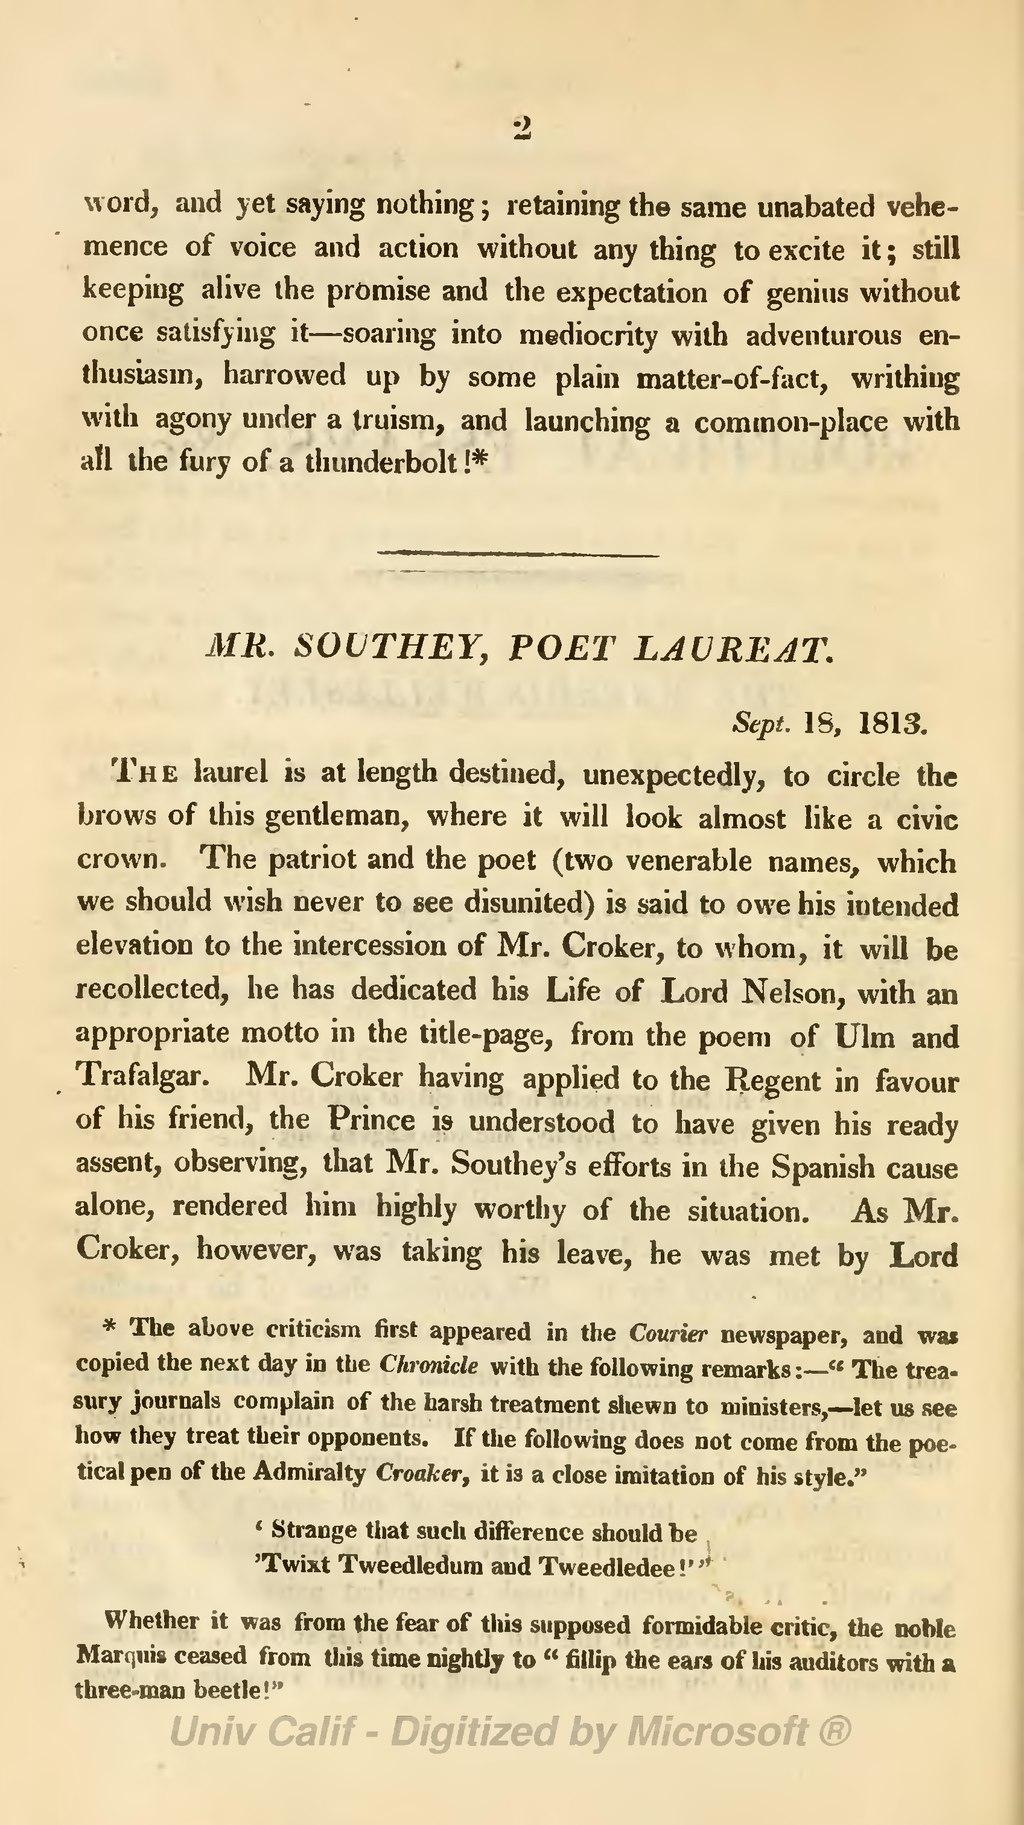 political essays hazlitt Provides careful analysis of hazlitt's political prose offers sustained readings of political essays demonstrates that politics was central to hazlitt's critical.